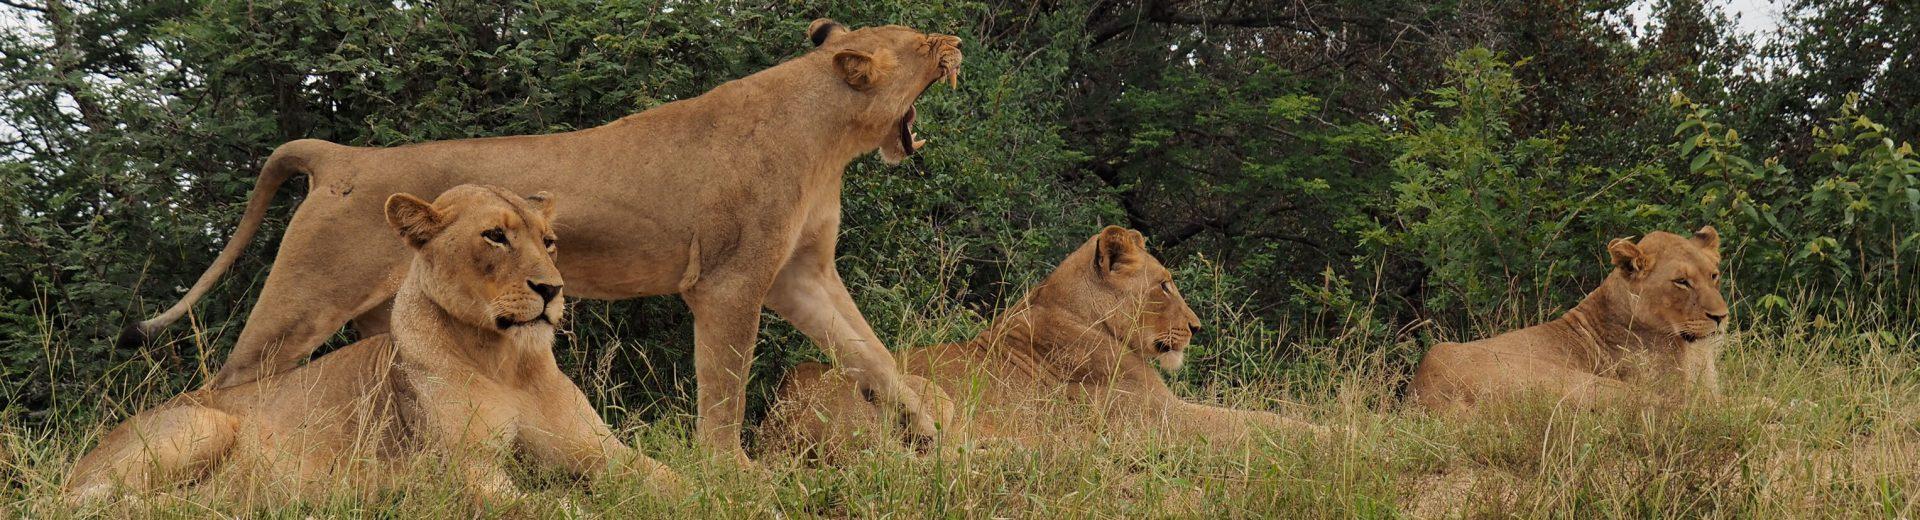 family of lions in kruger national park